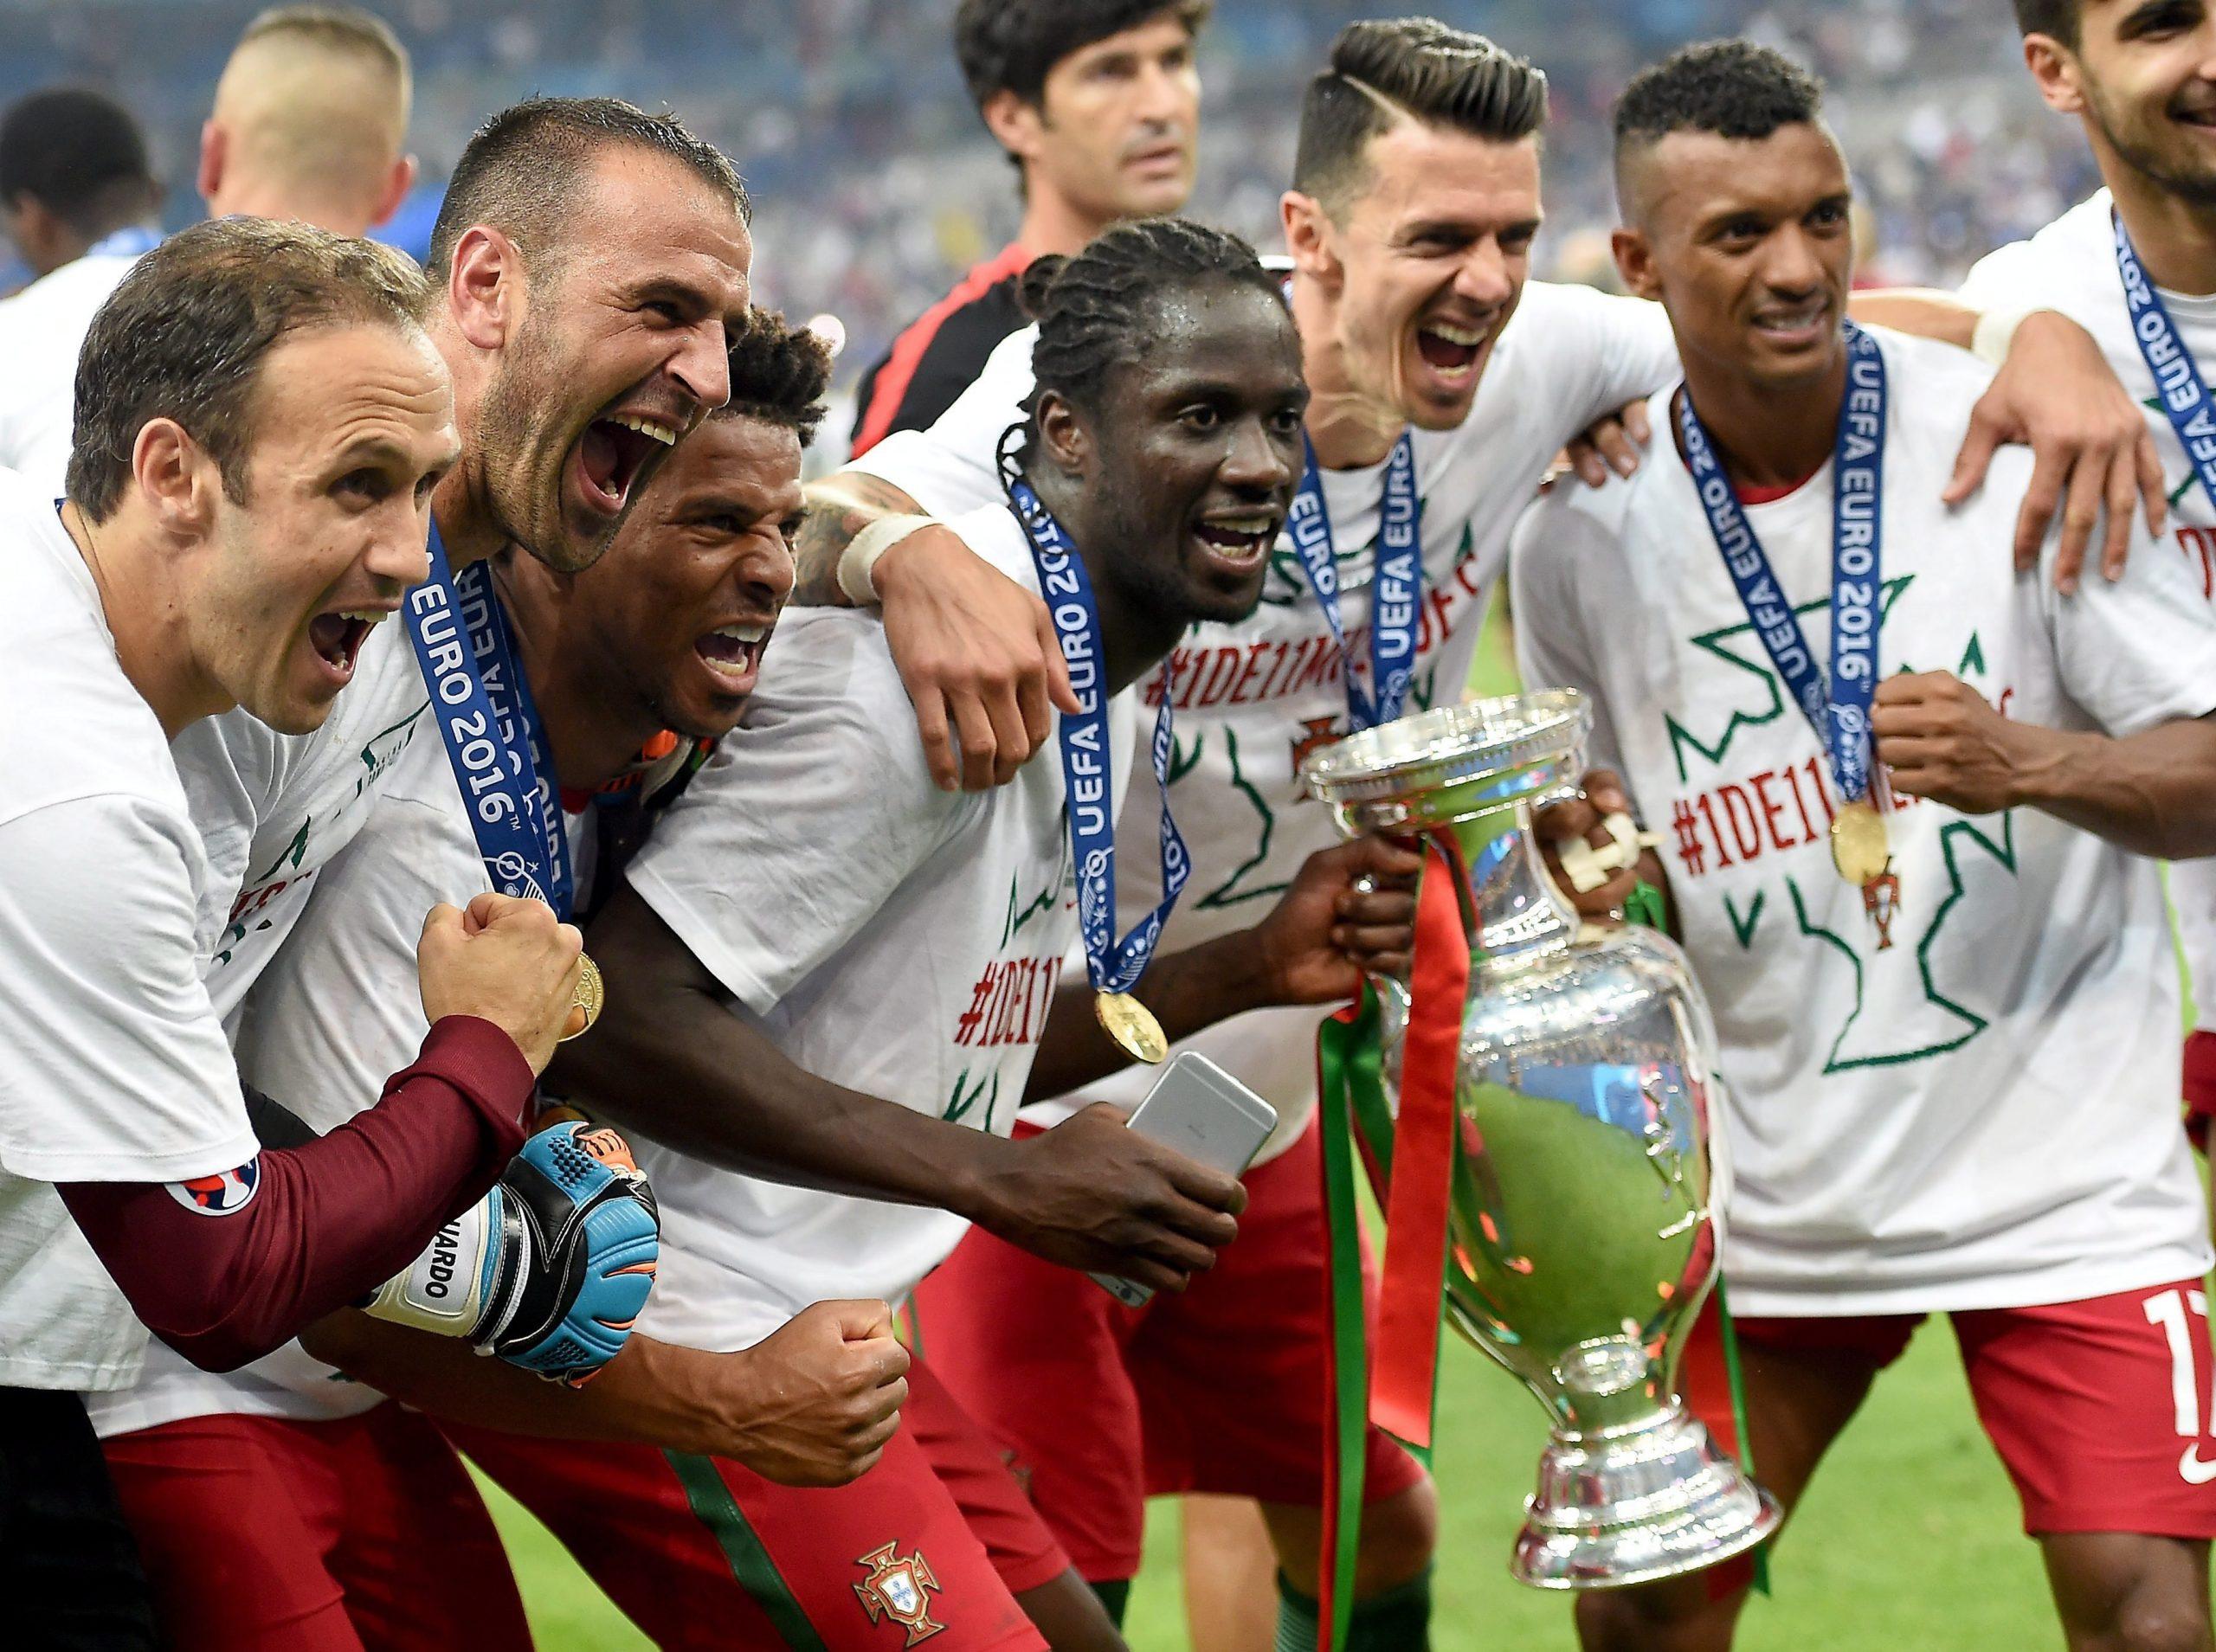 Euro 2020: Henri-Delaunay-Pokal in Ungarn